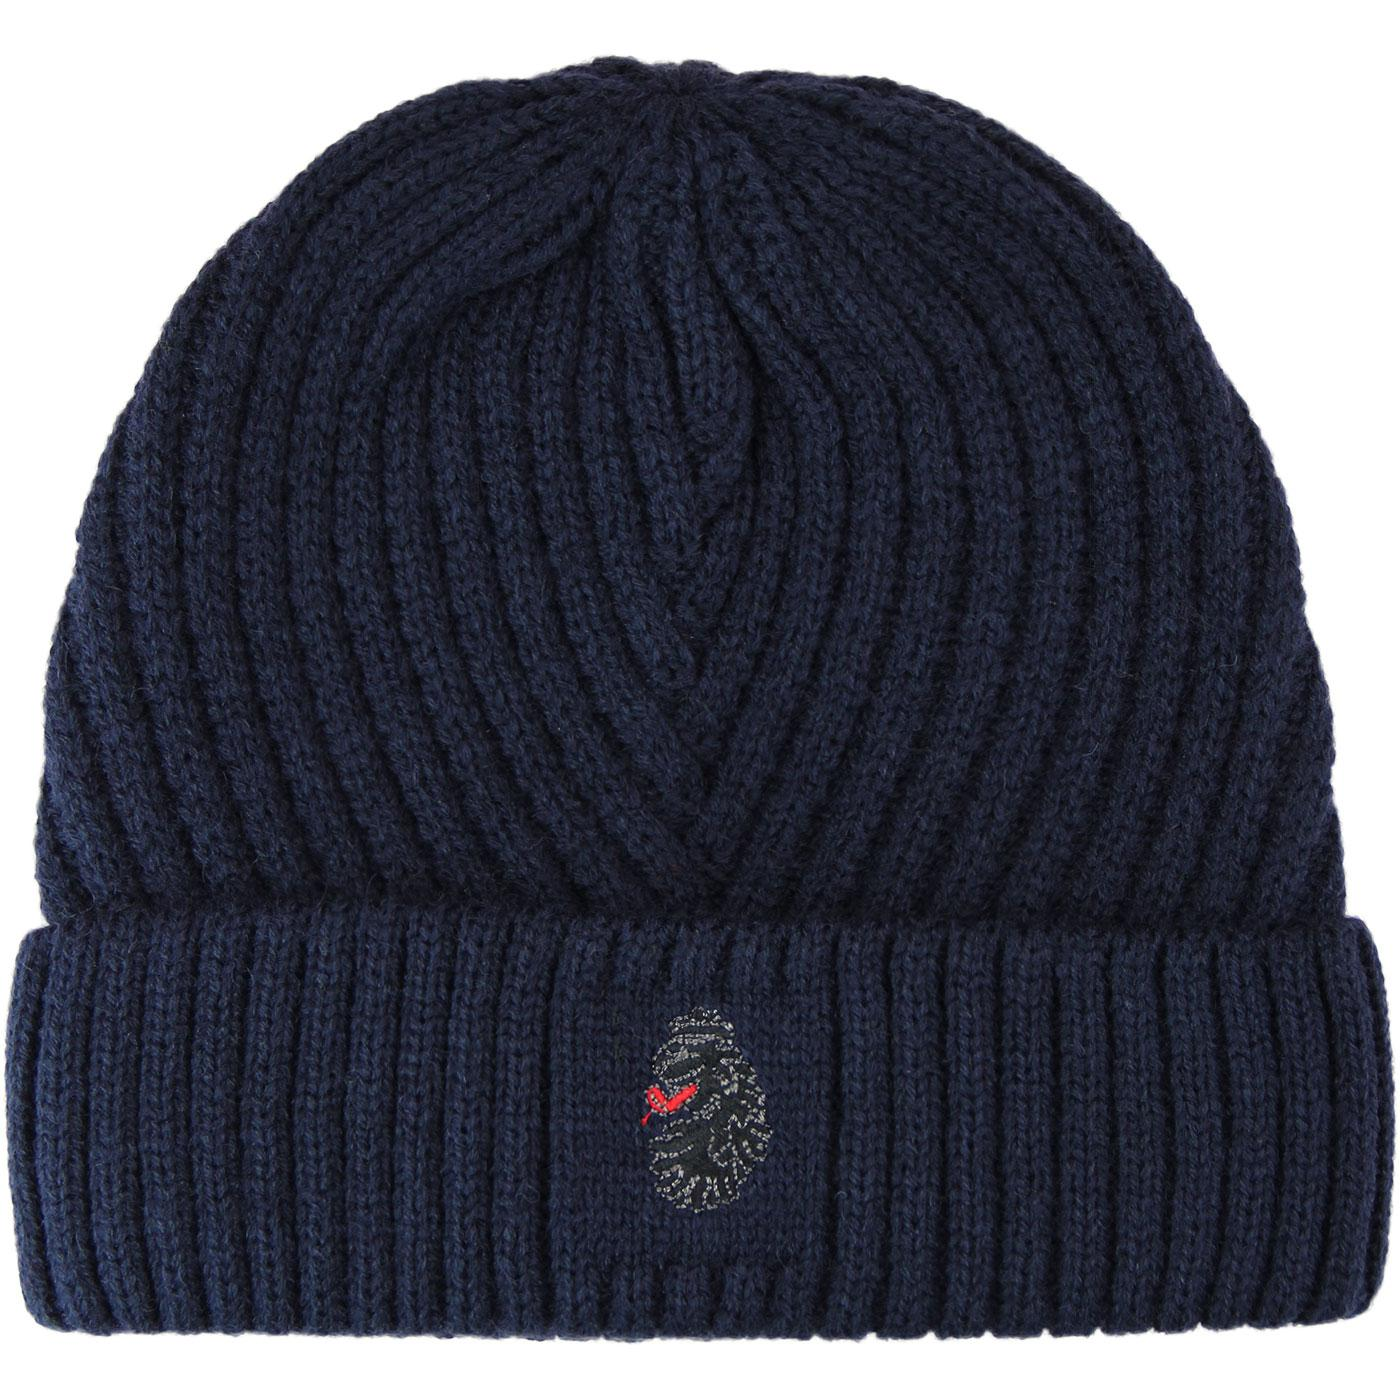 Osh LUKE 1977 Retro Ribbed Knitted Beanie Hat